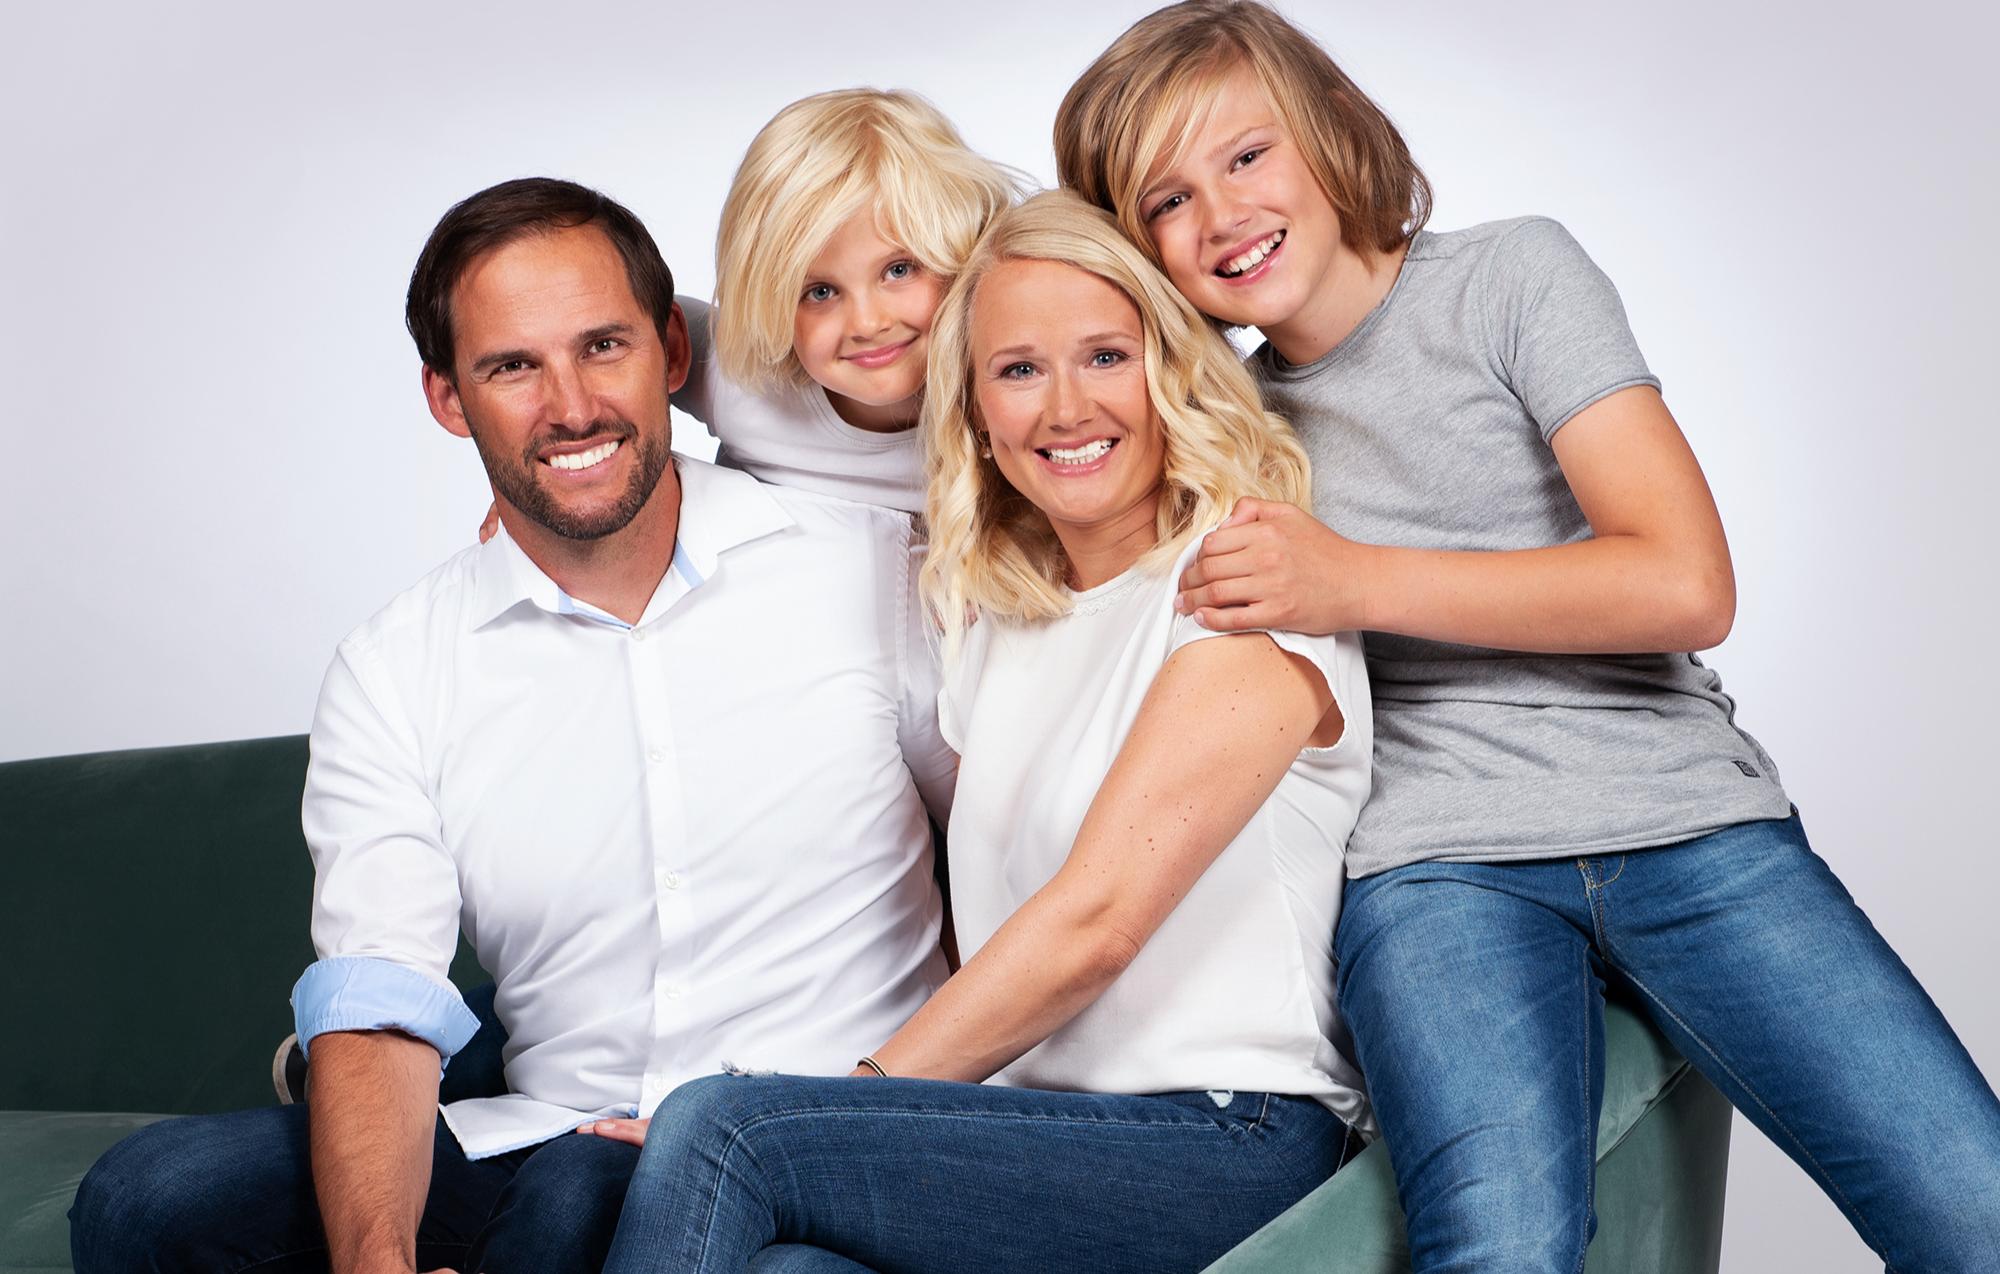 familien-fotoshooting-schwerin-bg51612878970